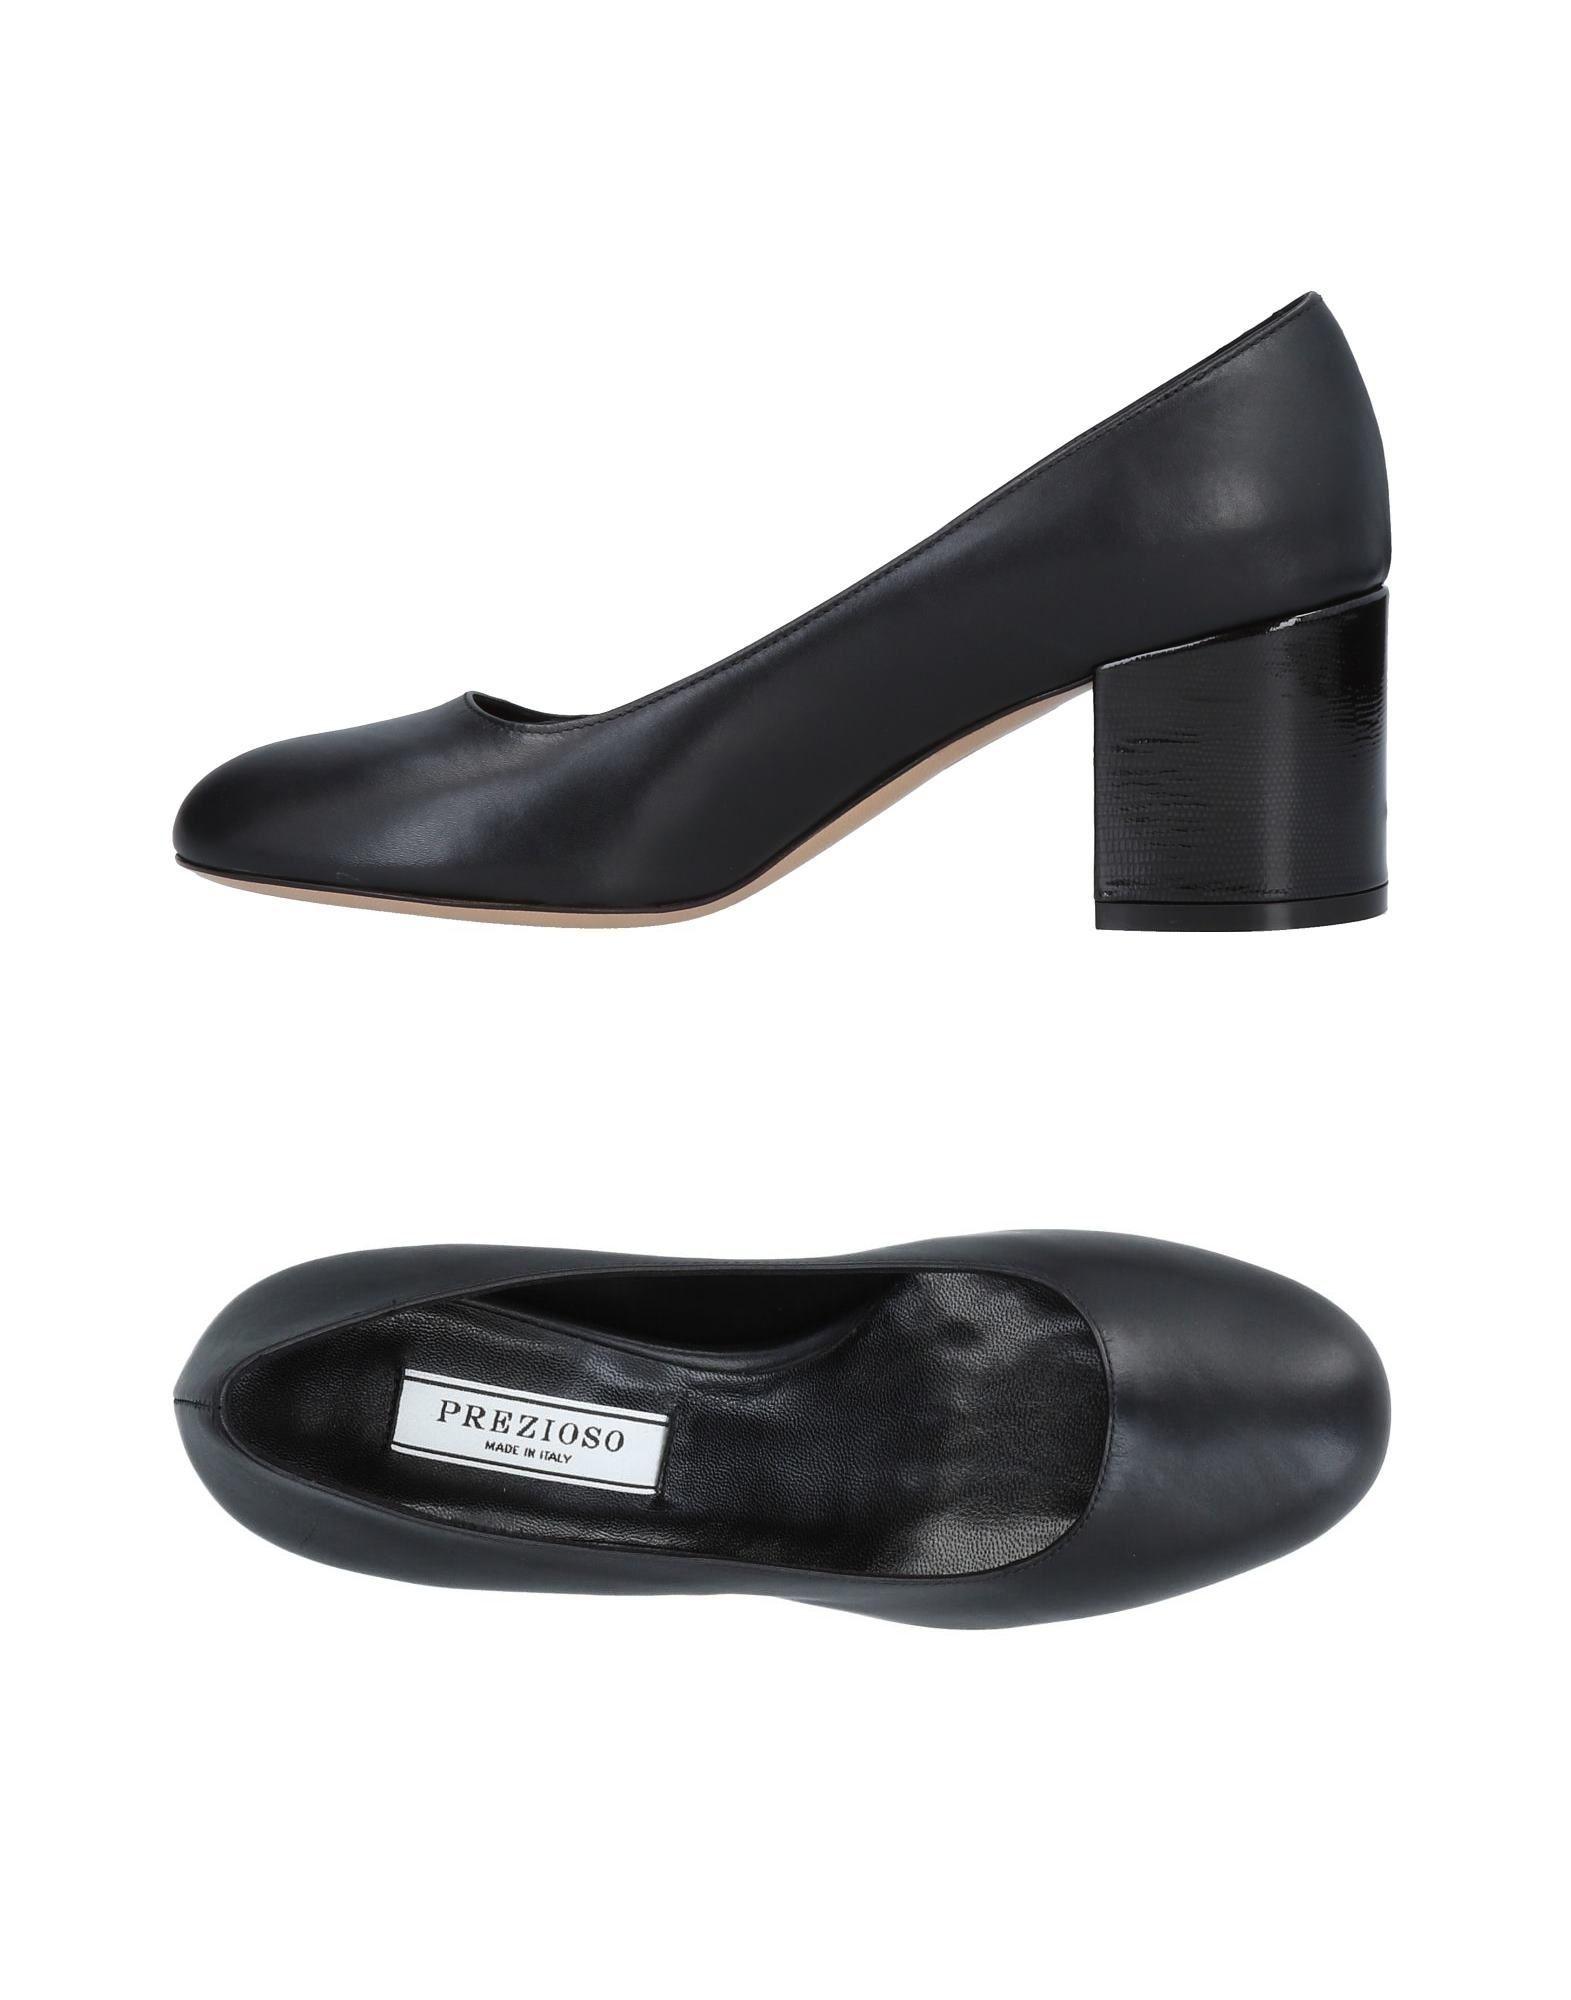 Sandali Melissa offerte Donna - 11346181WD Nuove offerte Melissa e scarpe comode 23b04b